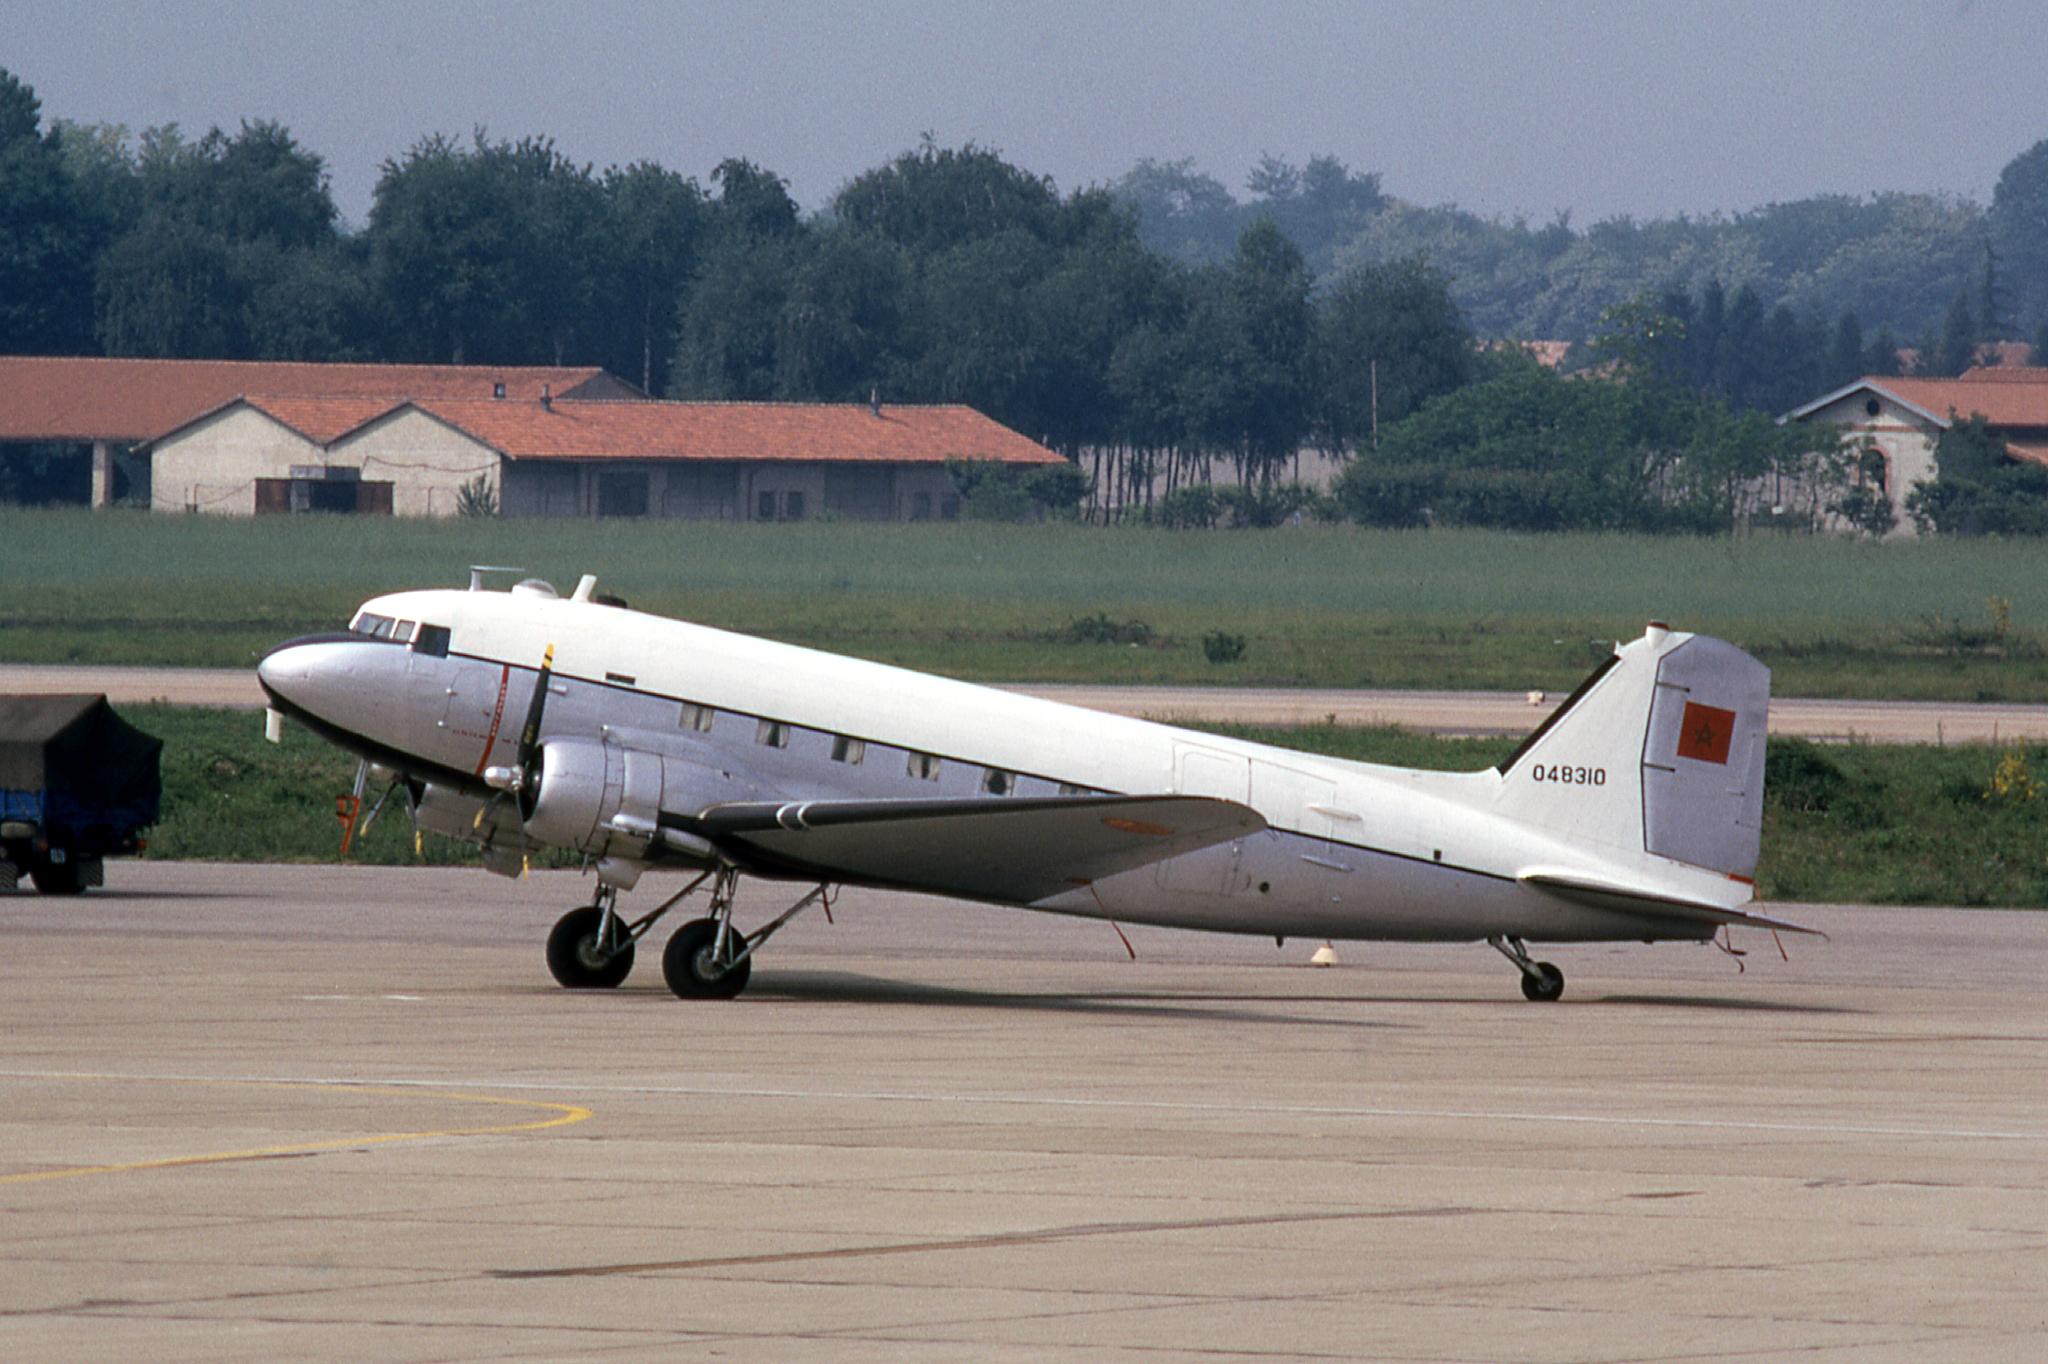 FRA: Photos anciens avions des FRA - Page 12 47076946811_975a3df4d6_o